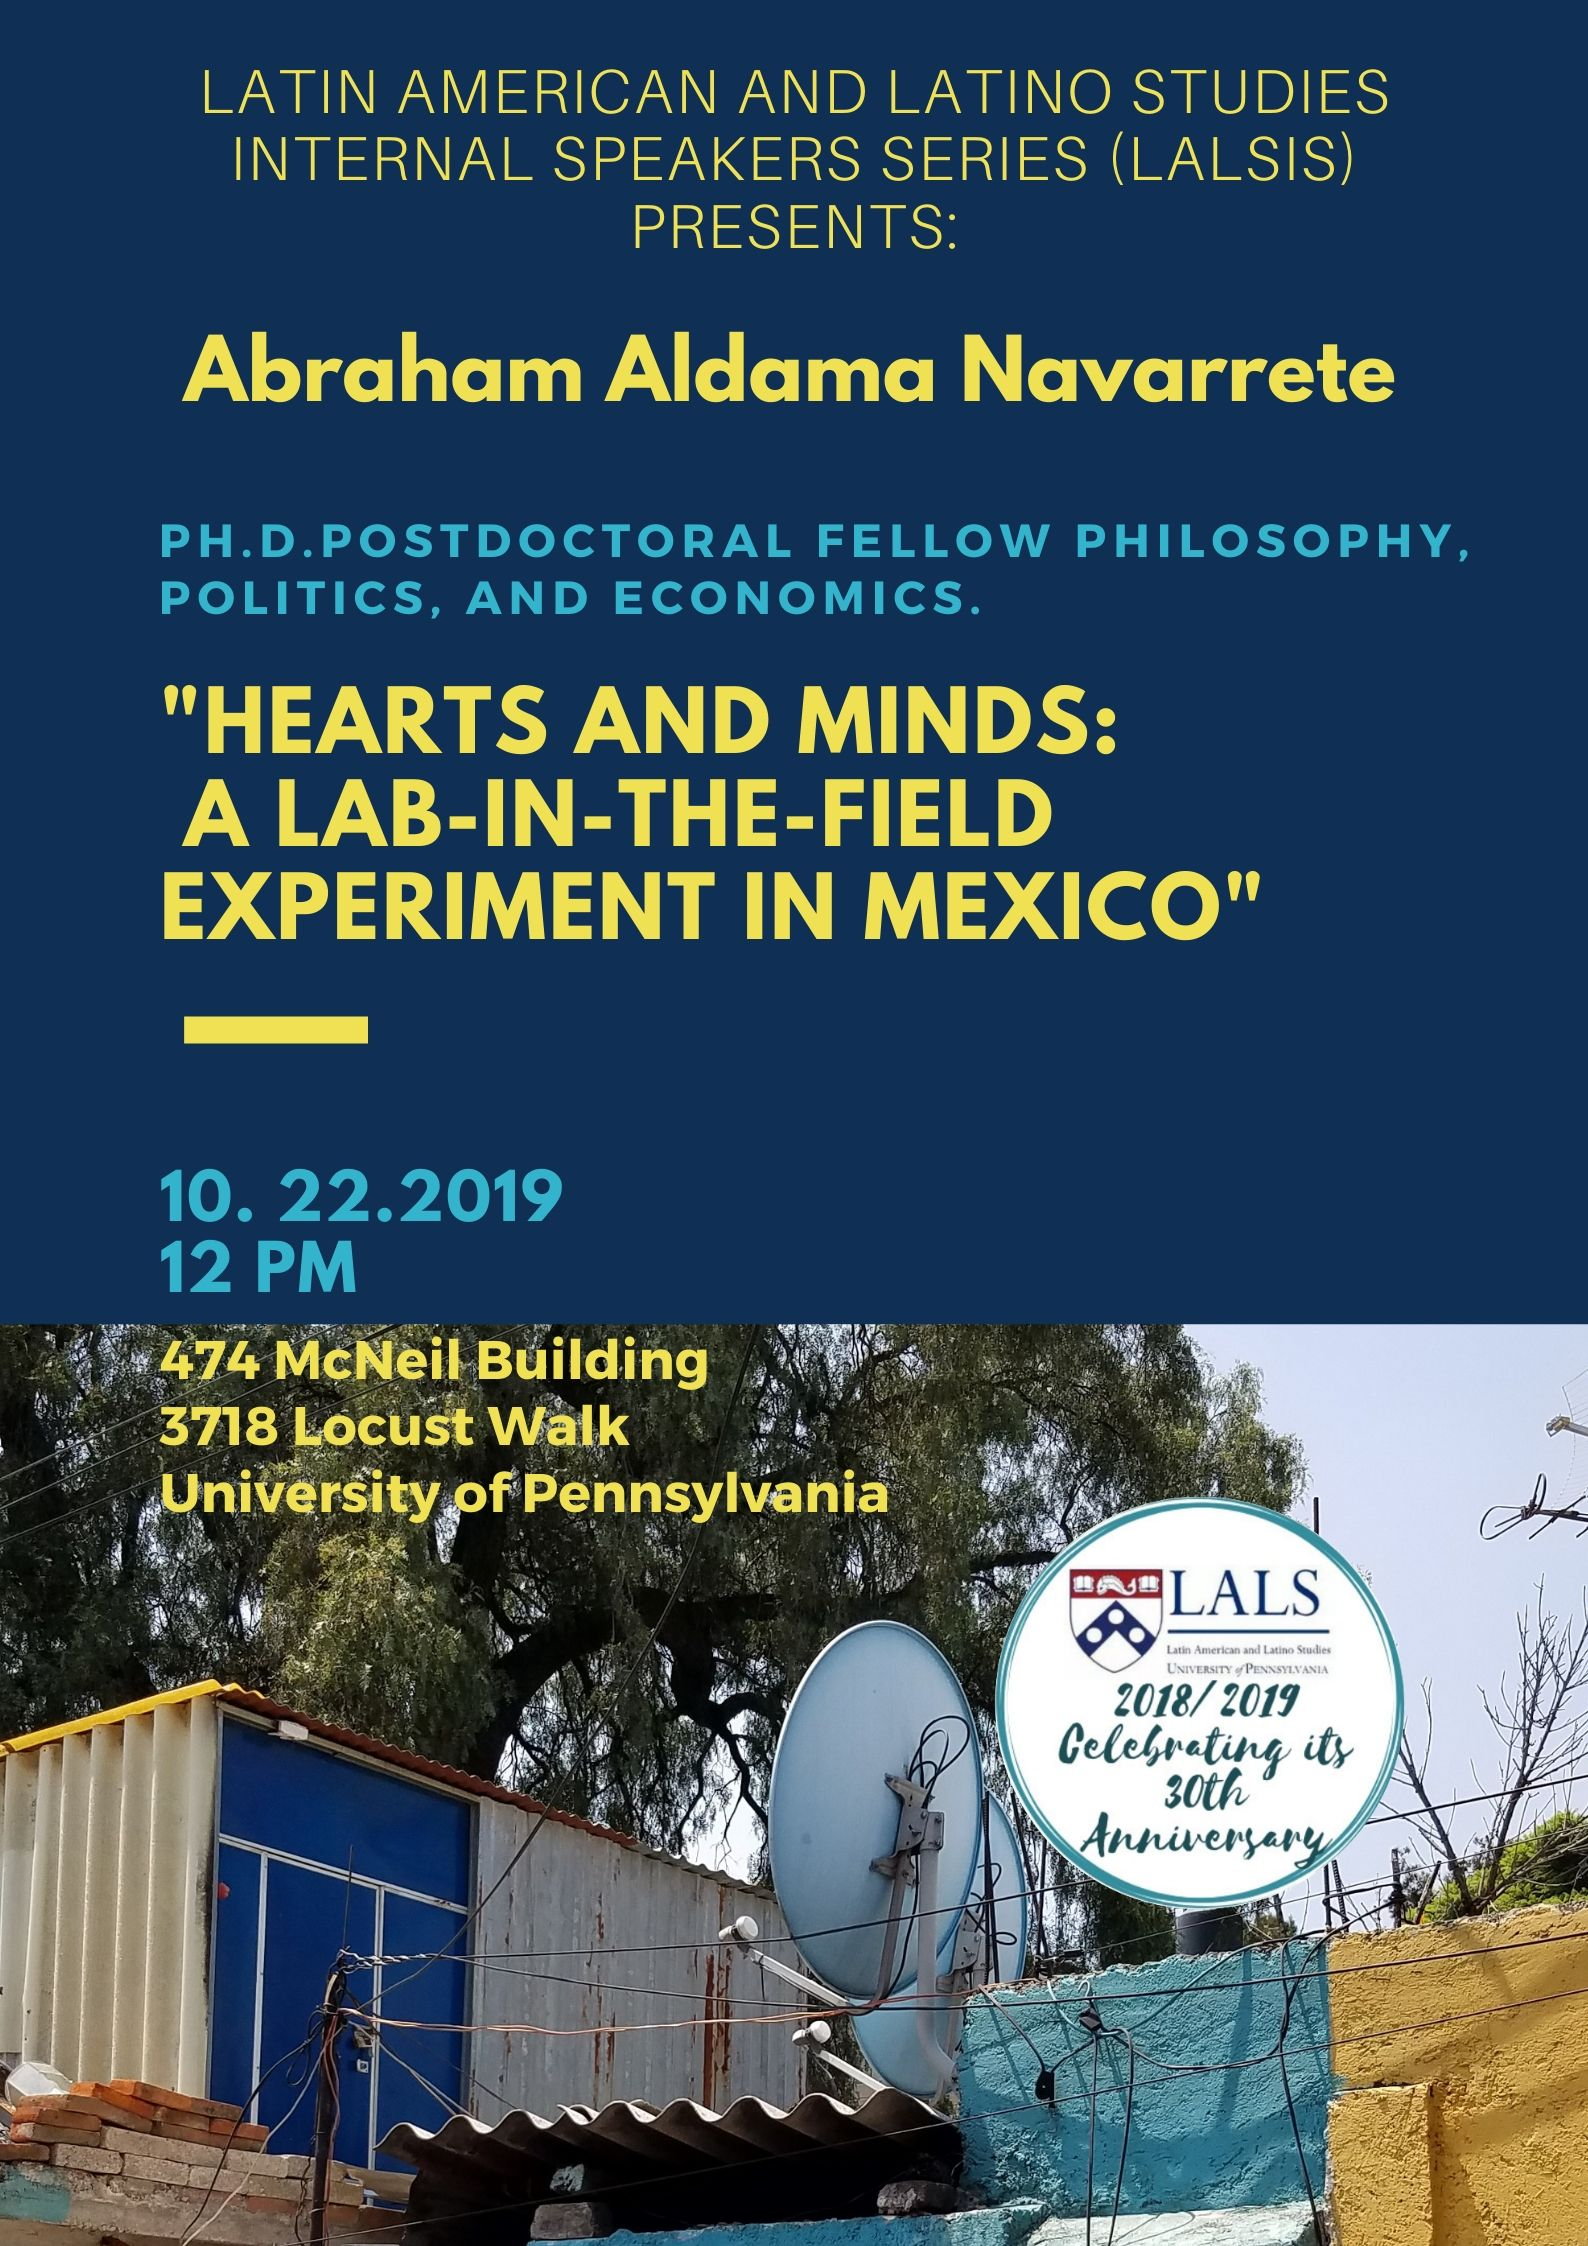 Poster LALSIS Abraham Aldama Navarrete